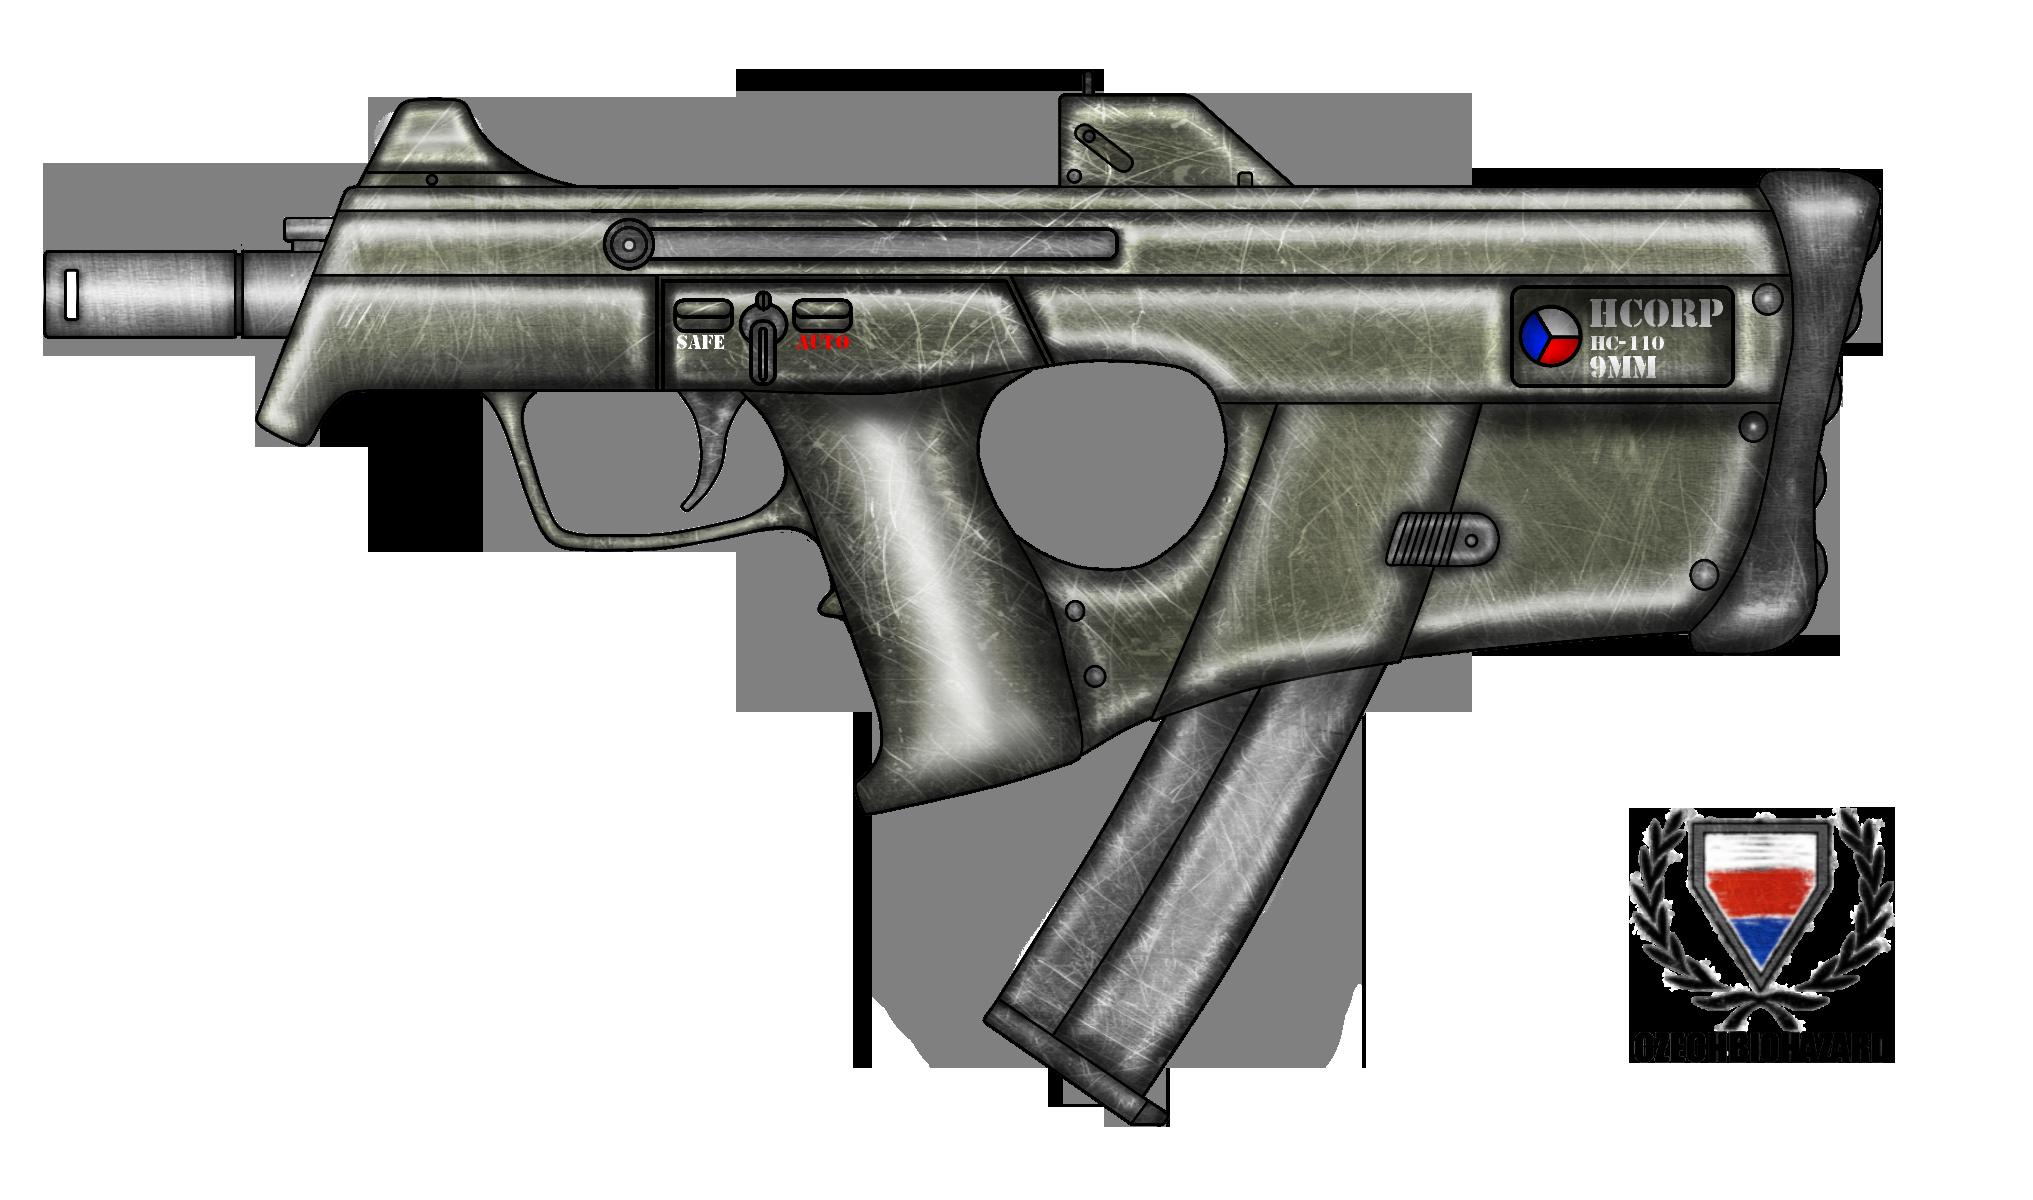 Drawn pistol submachine gun 110 Fictional HC by HC